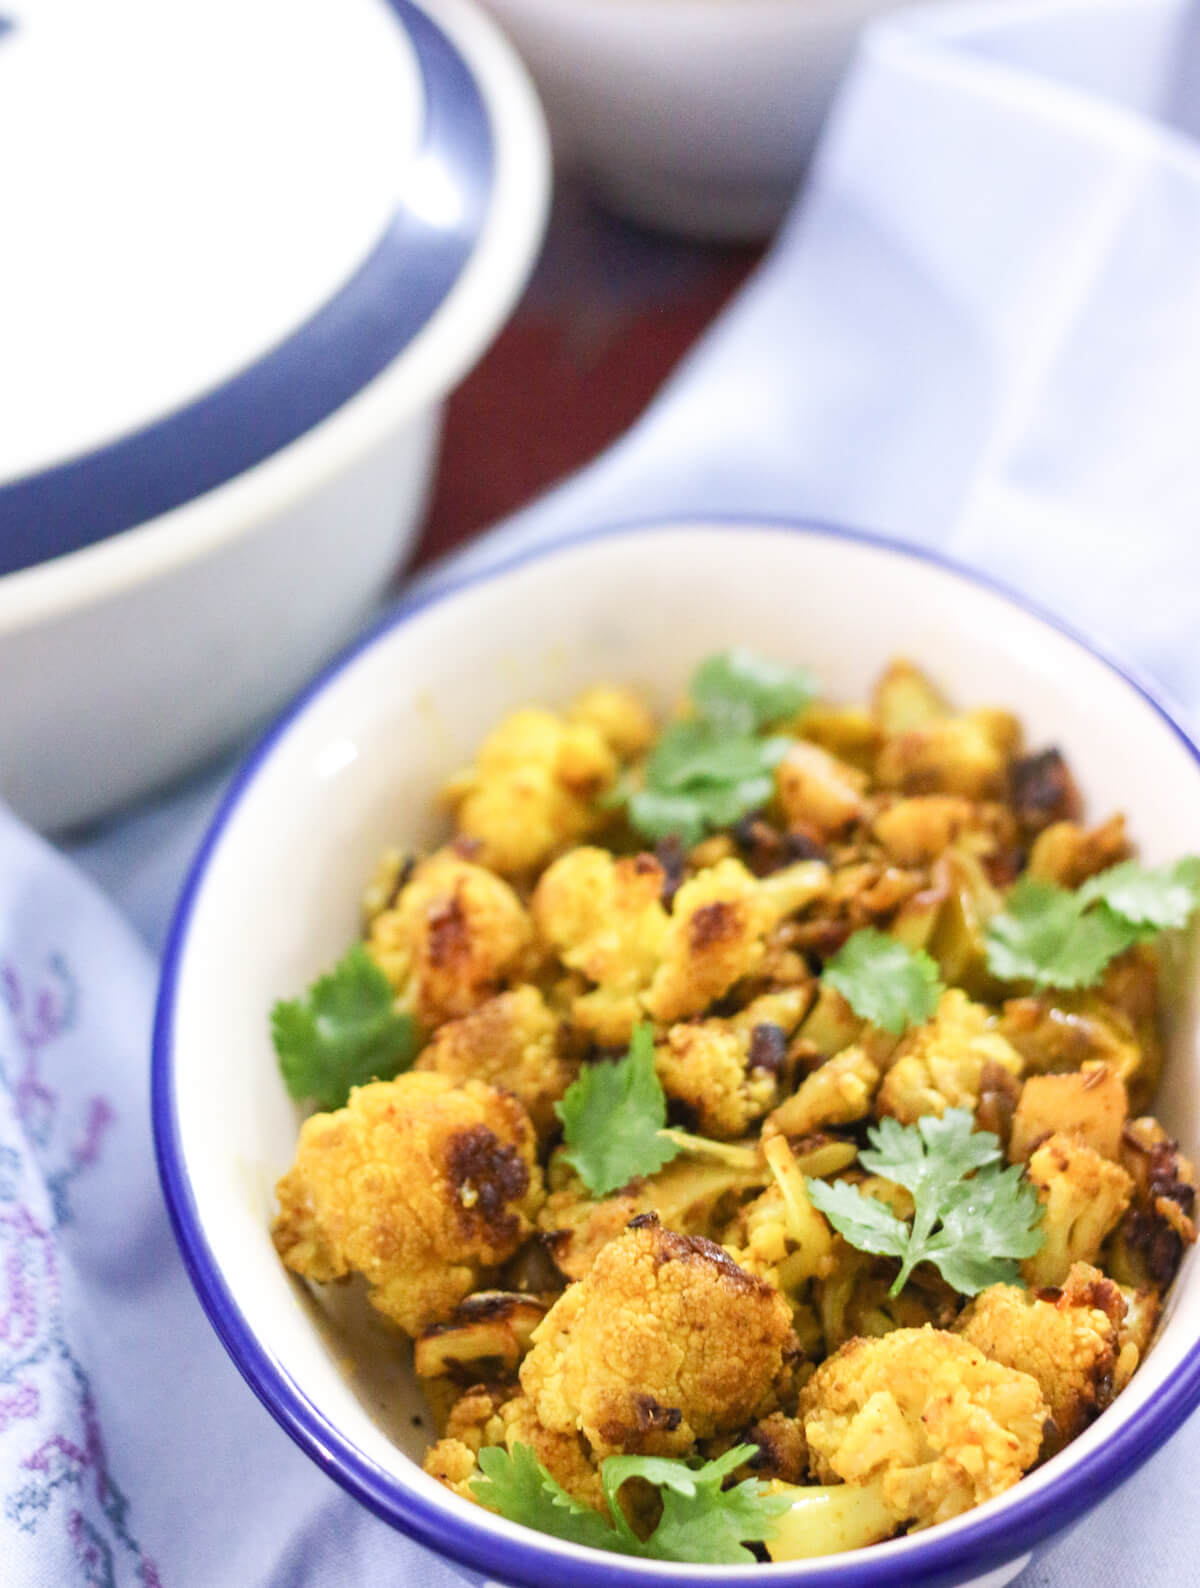 roasted cauliflower vegetable fry, turmeric spiced cauliflower